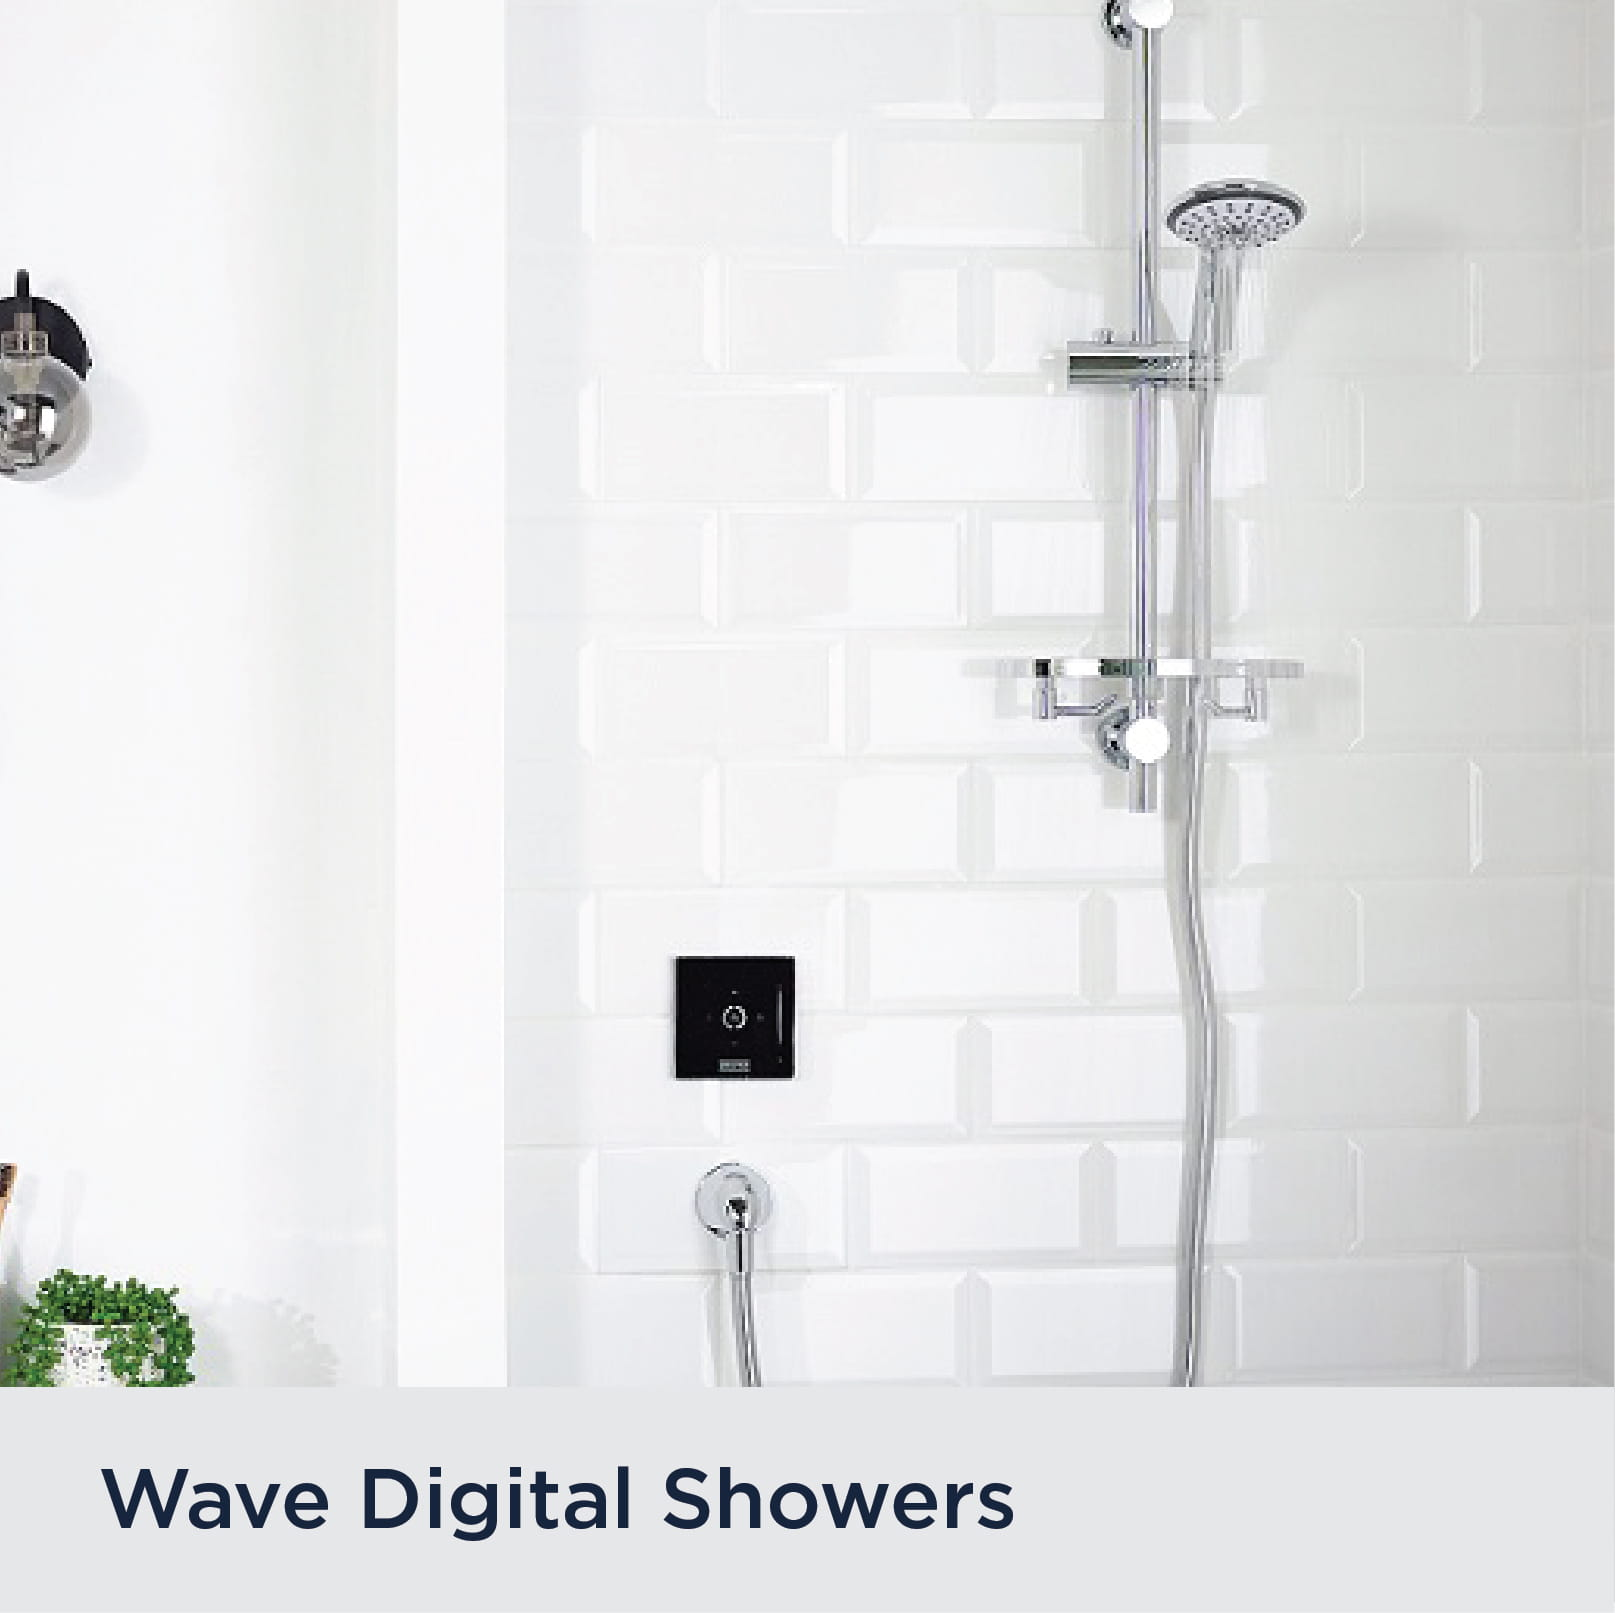 Discover Wave Digital Showers